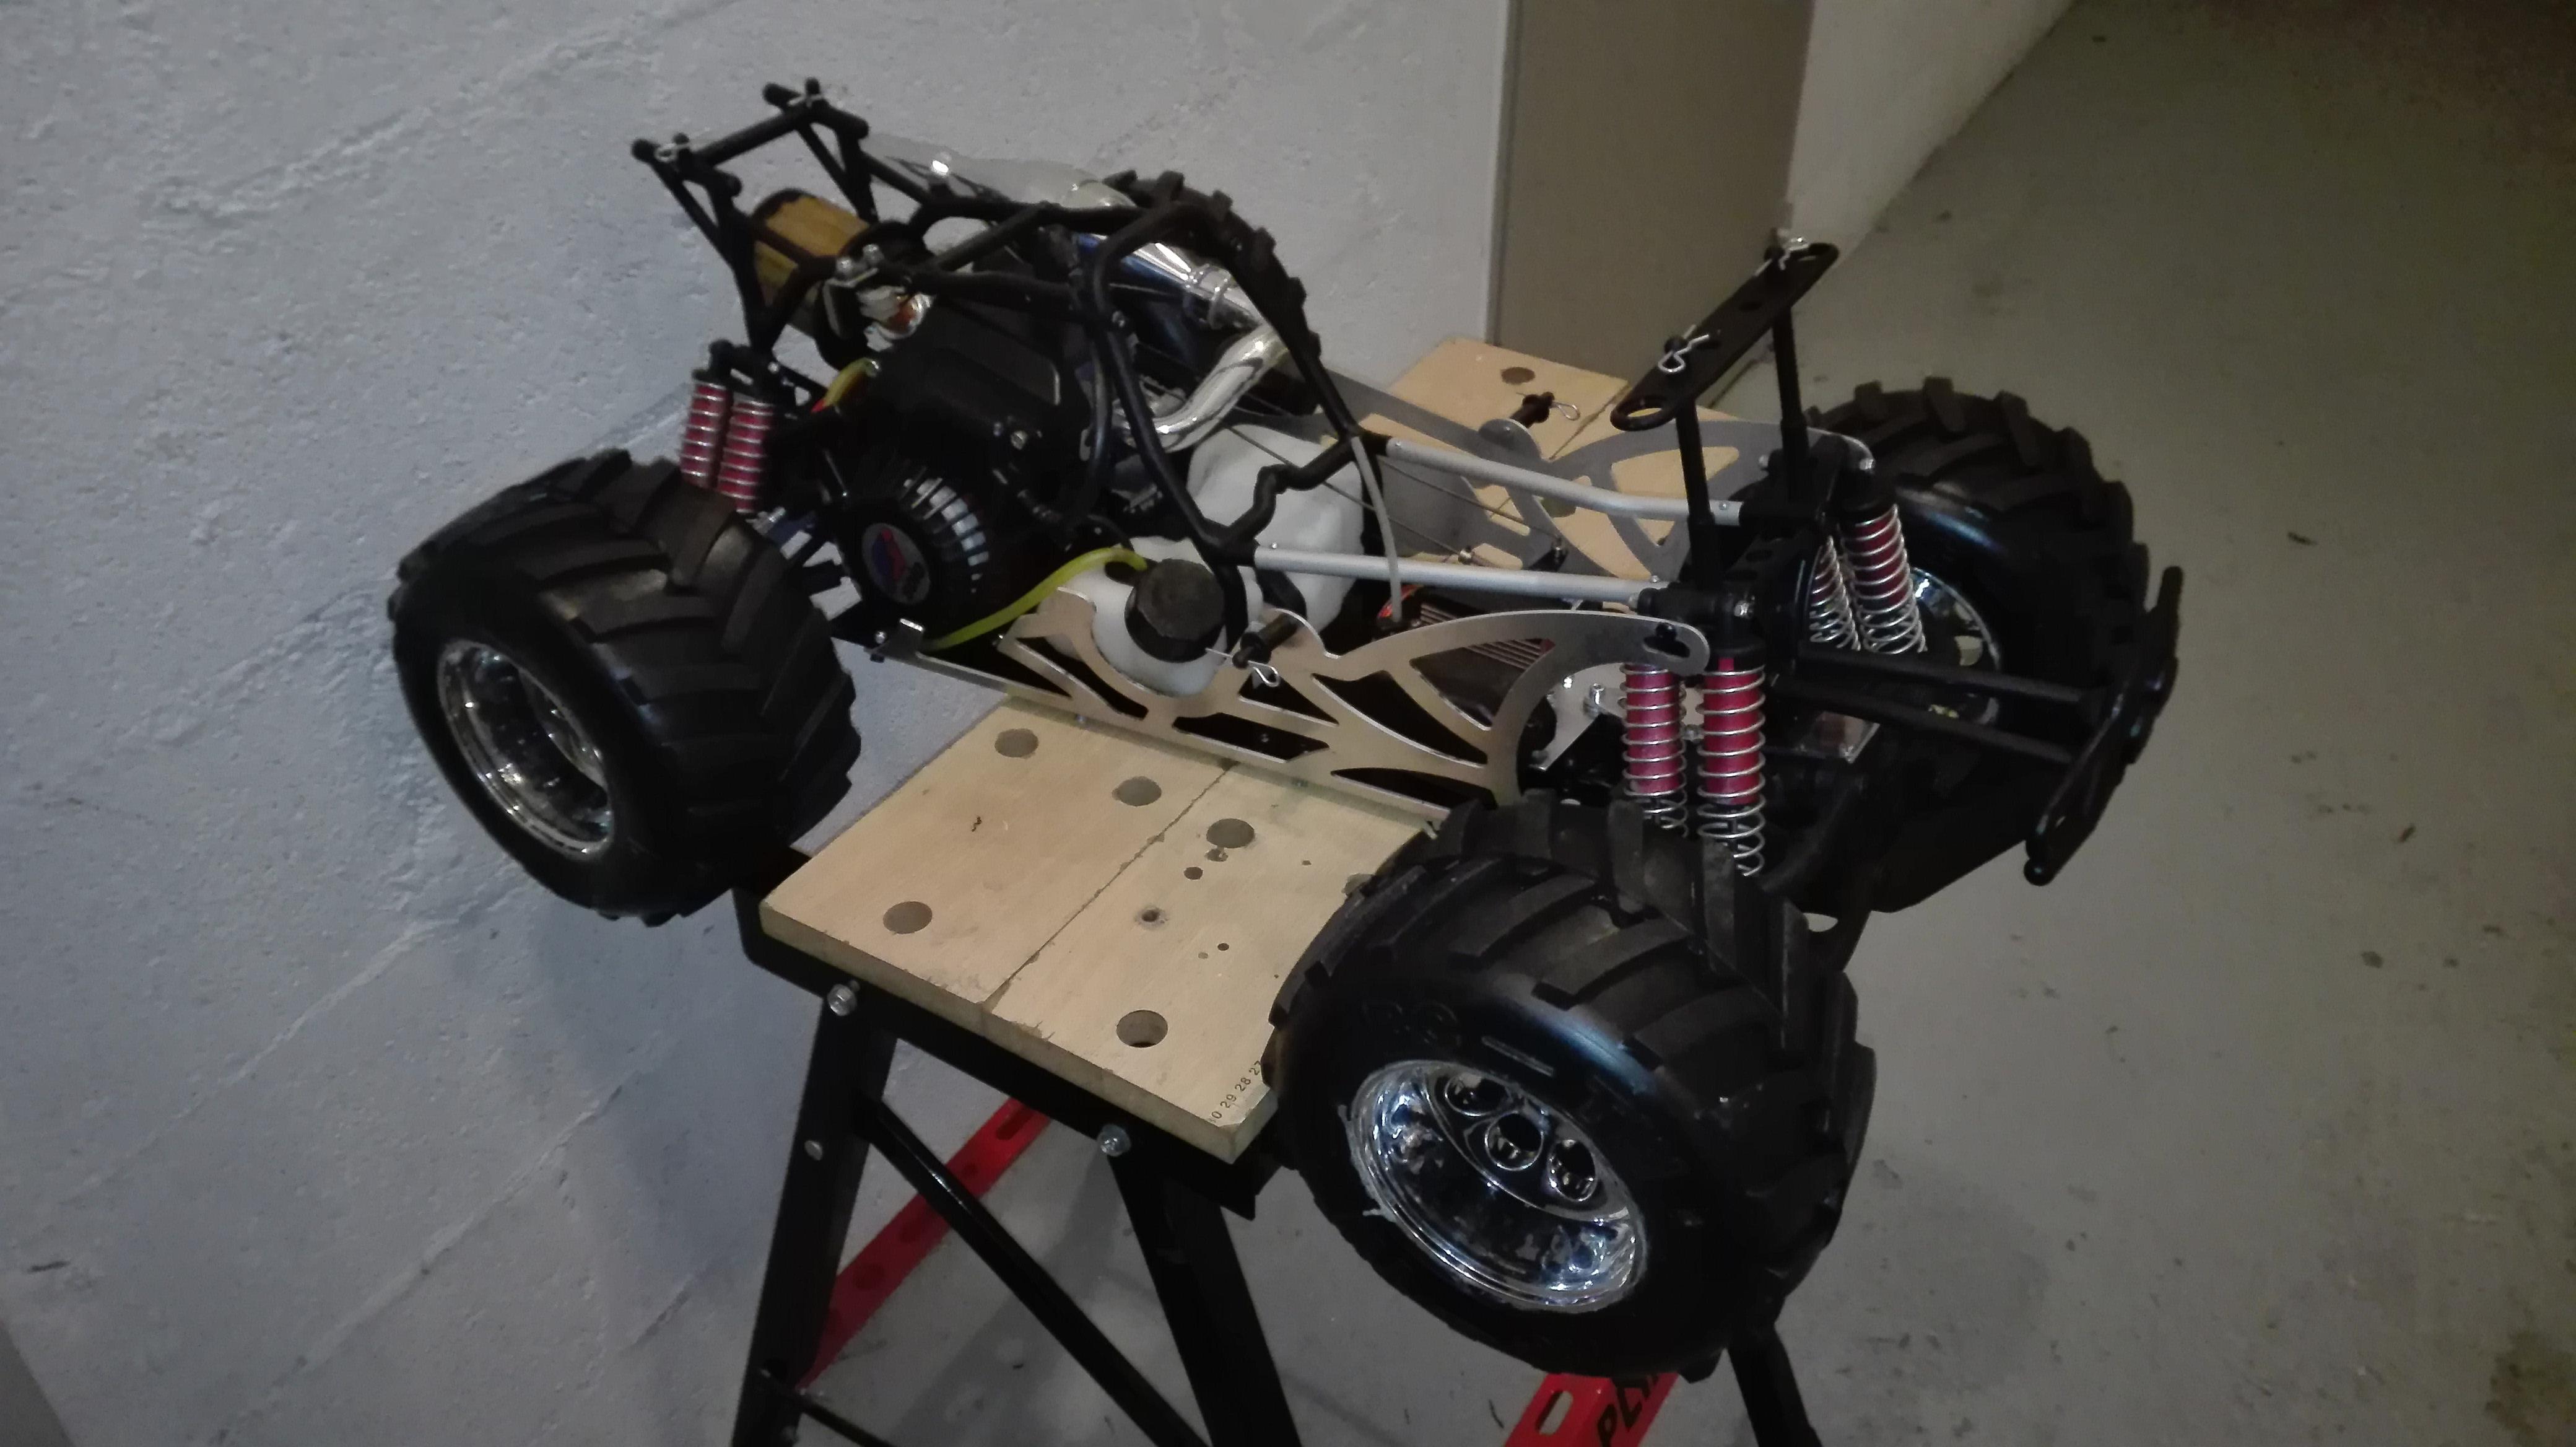 re-montage complet monster truck FG depuis un chassis nu - Page 2 180410111811497930